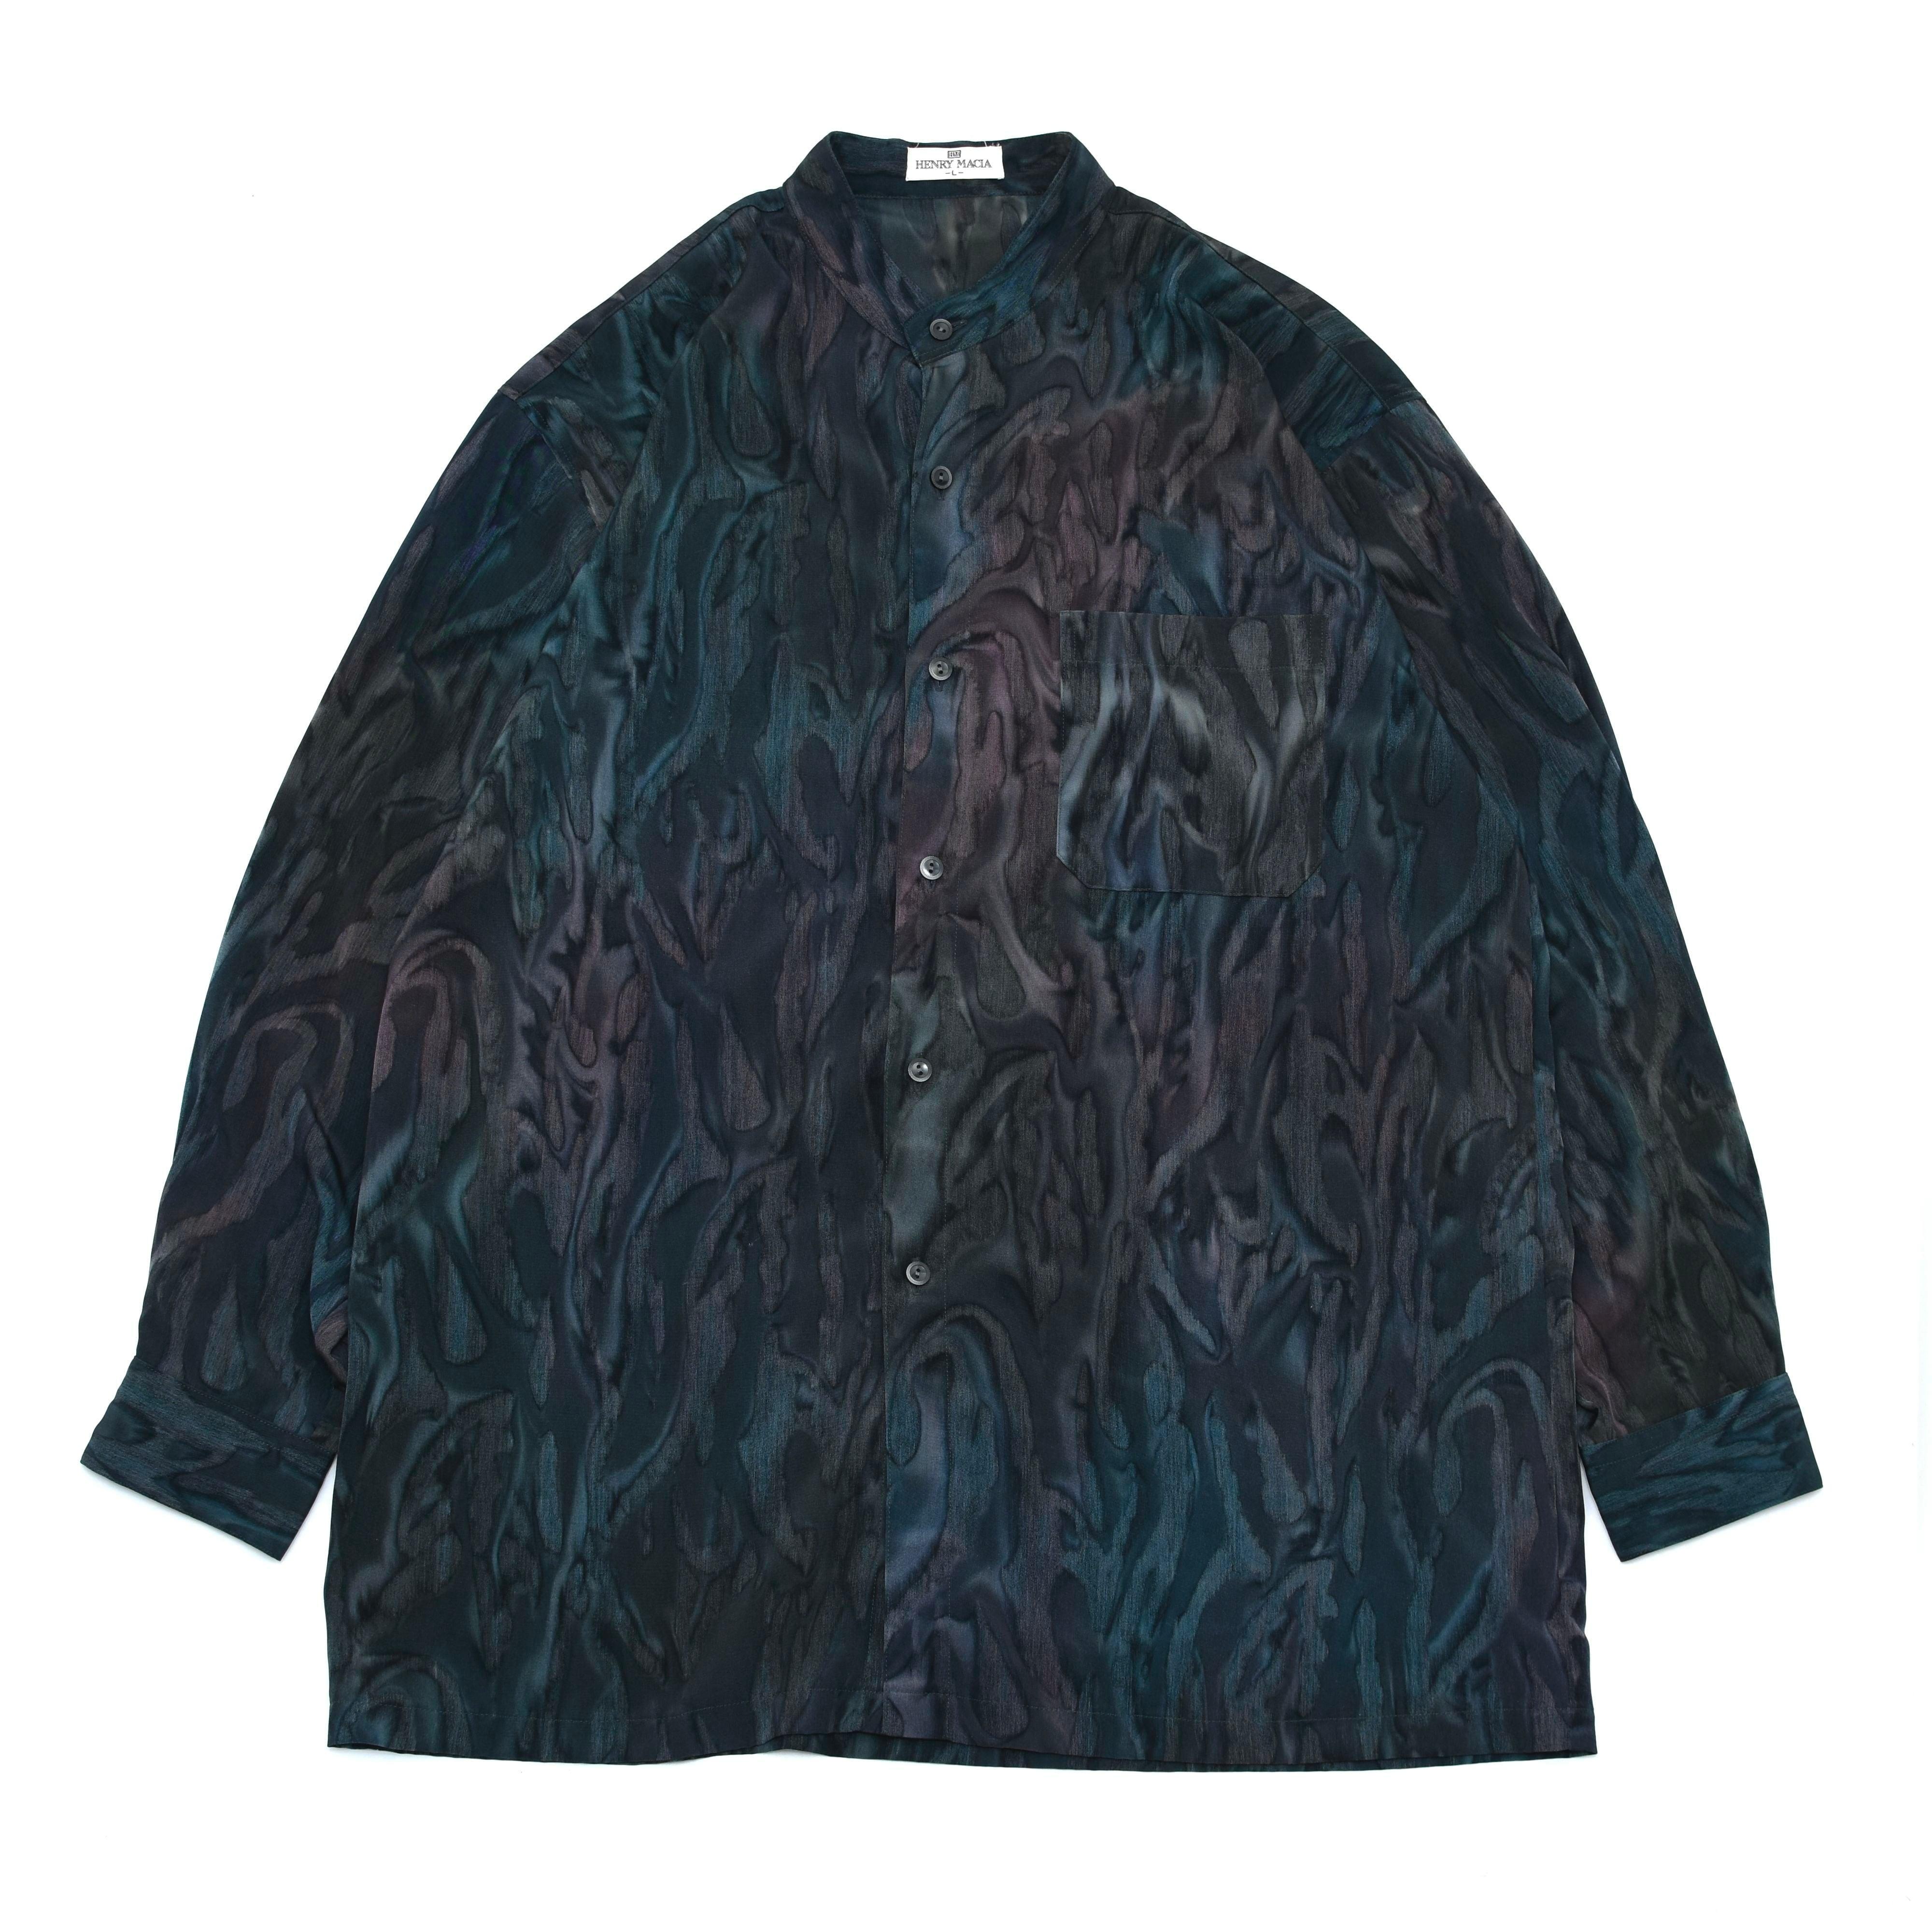 Marbling full pattern stand collar shirt